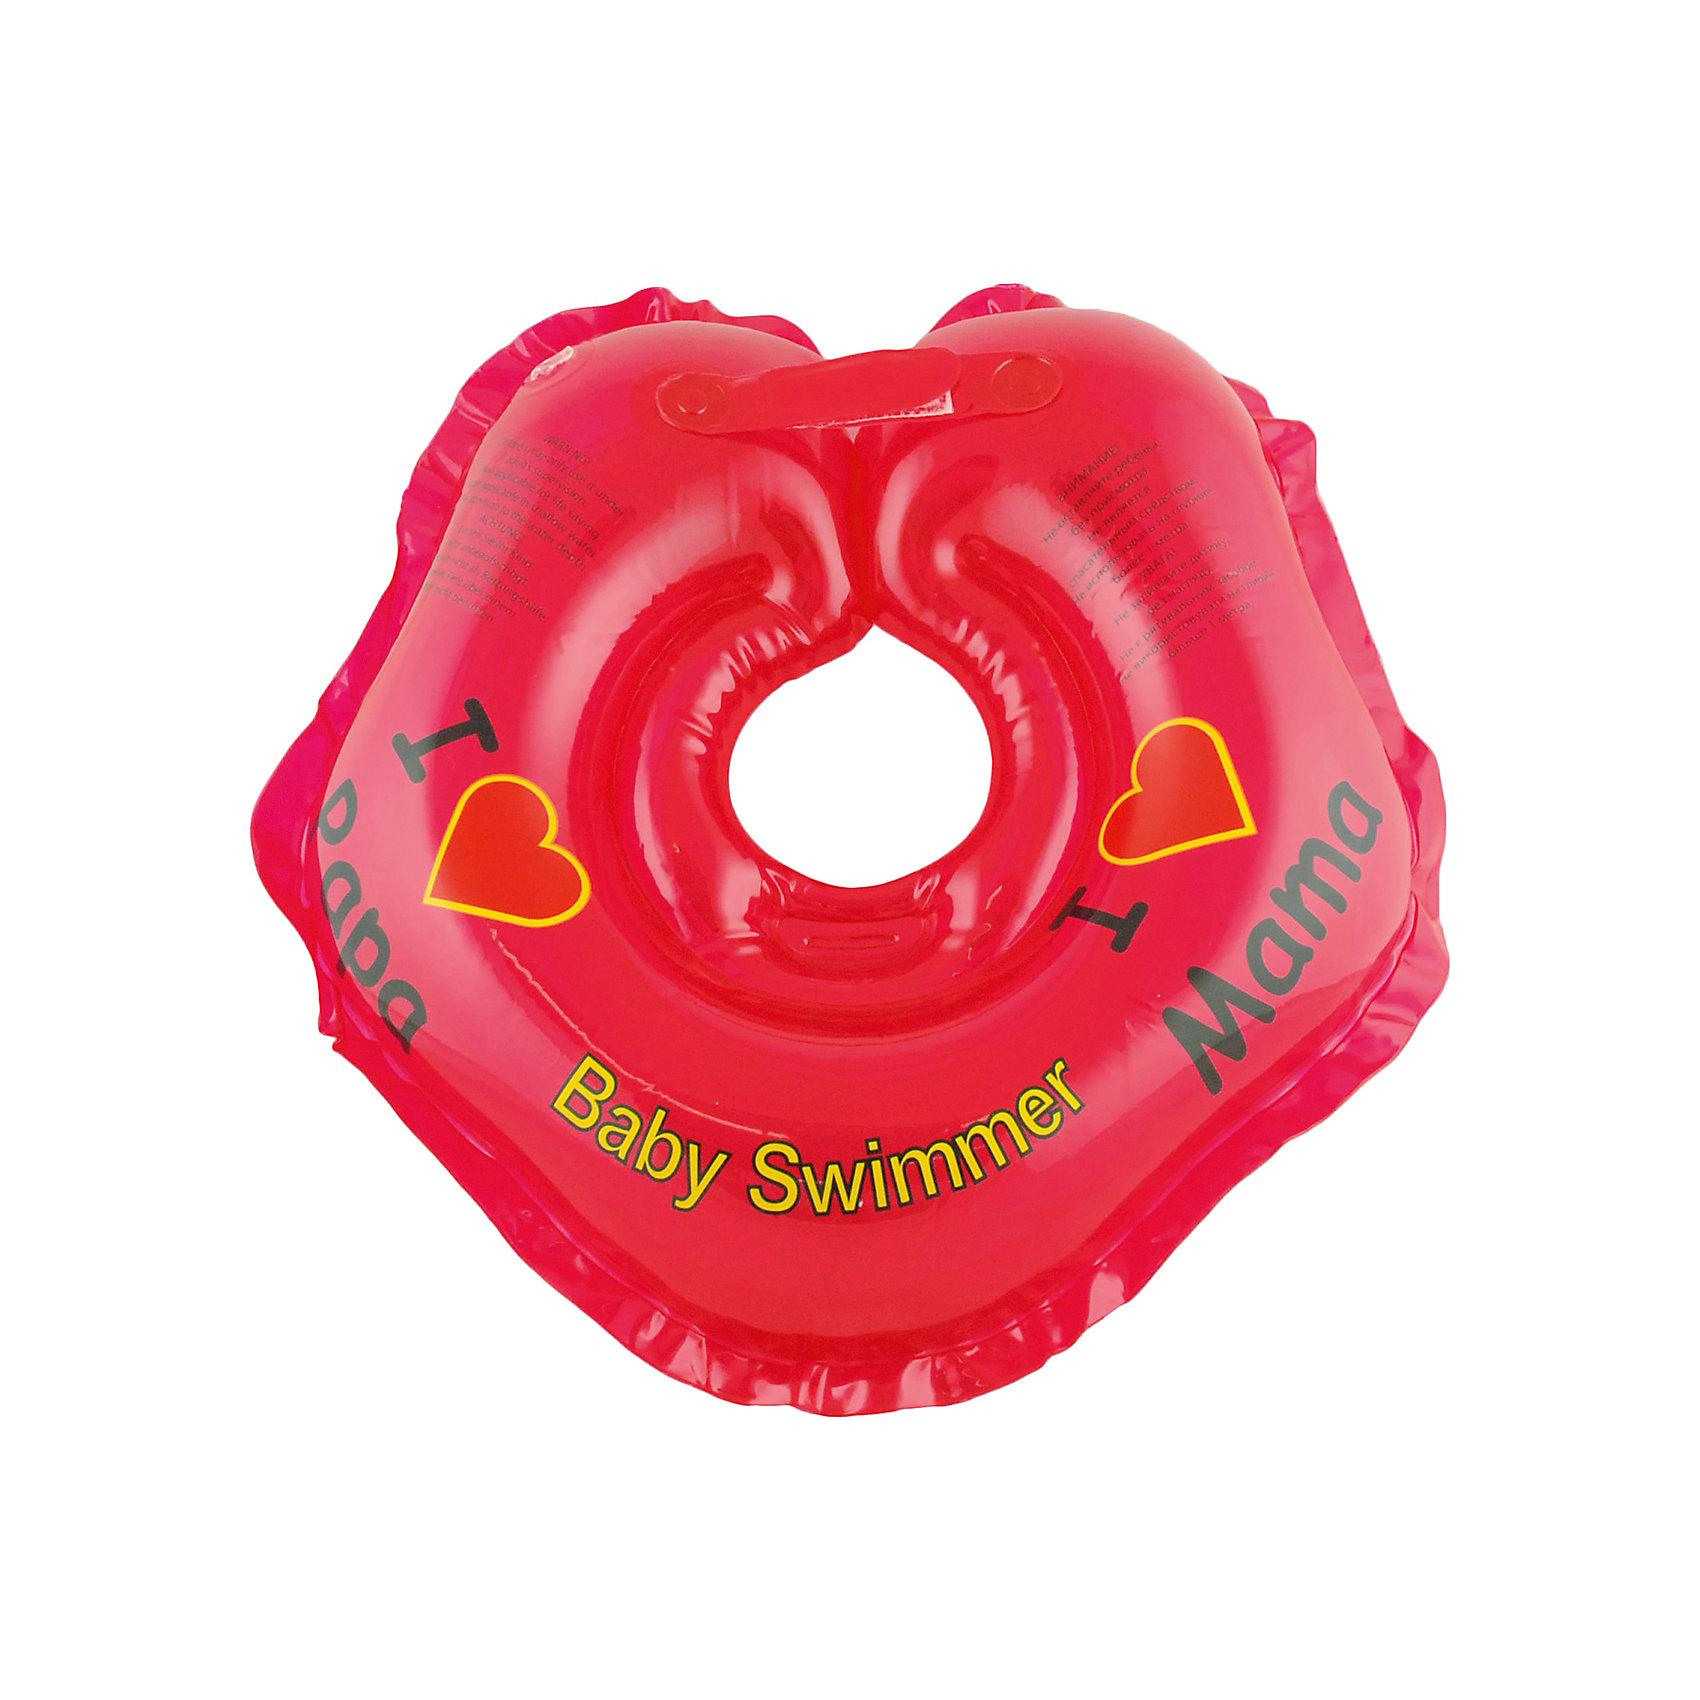 Круг для купания BabySwimmer, красный (Baby Swimmer)